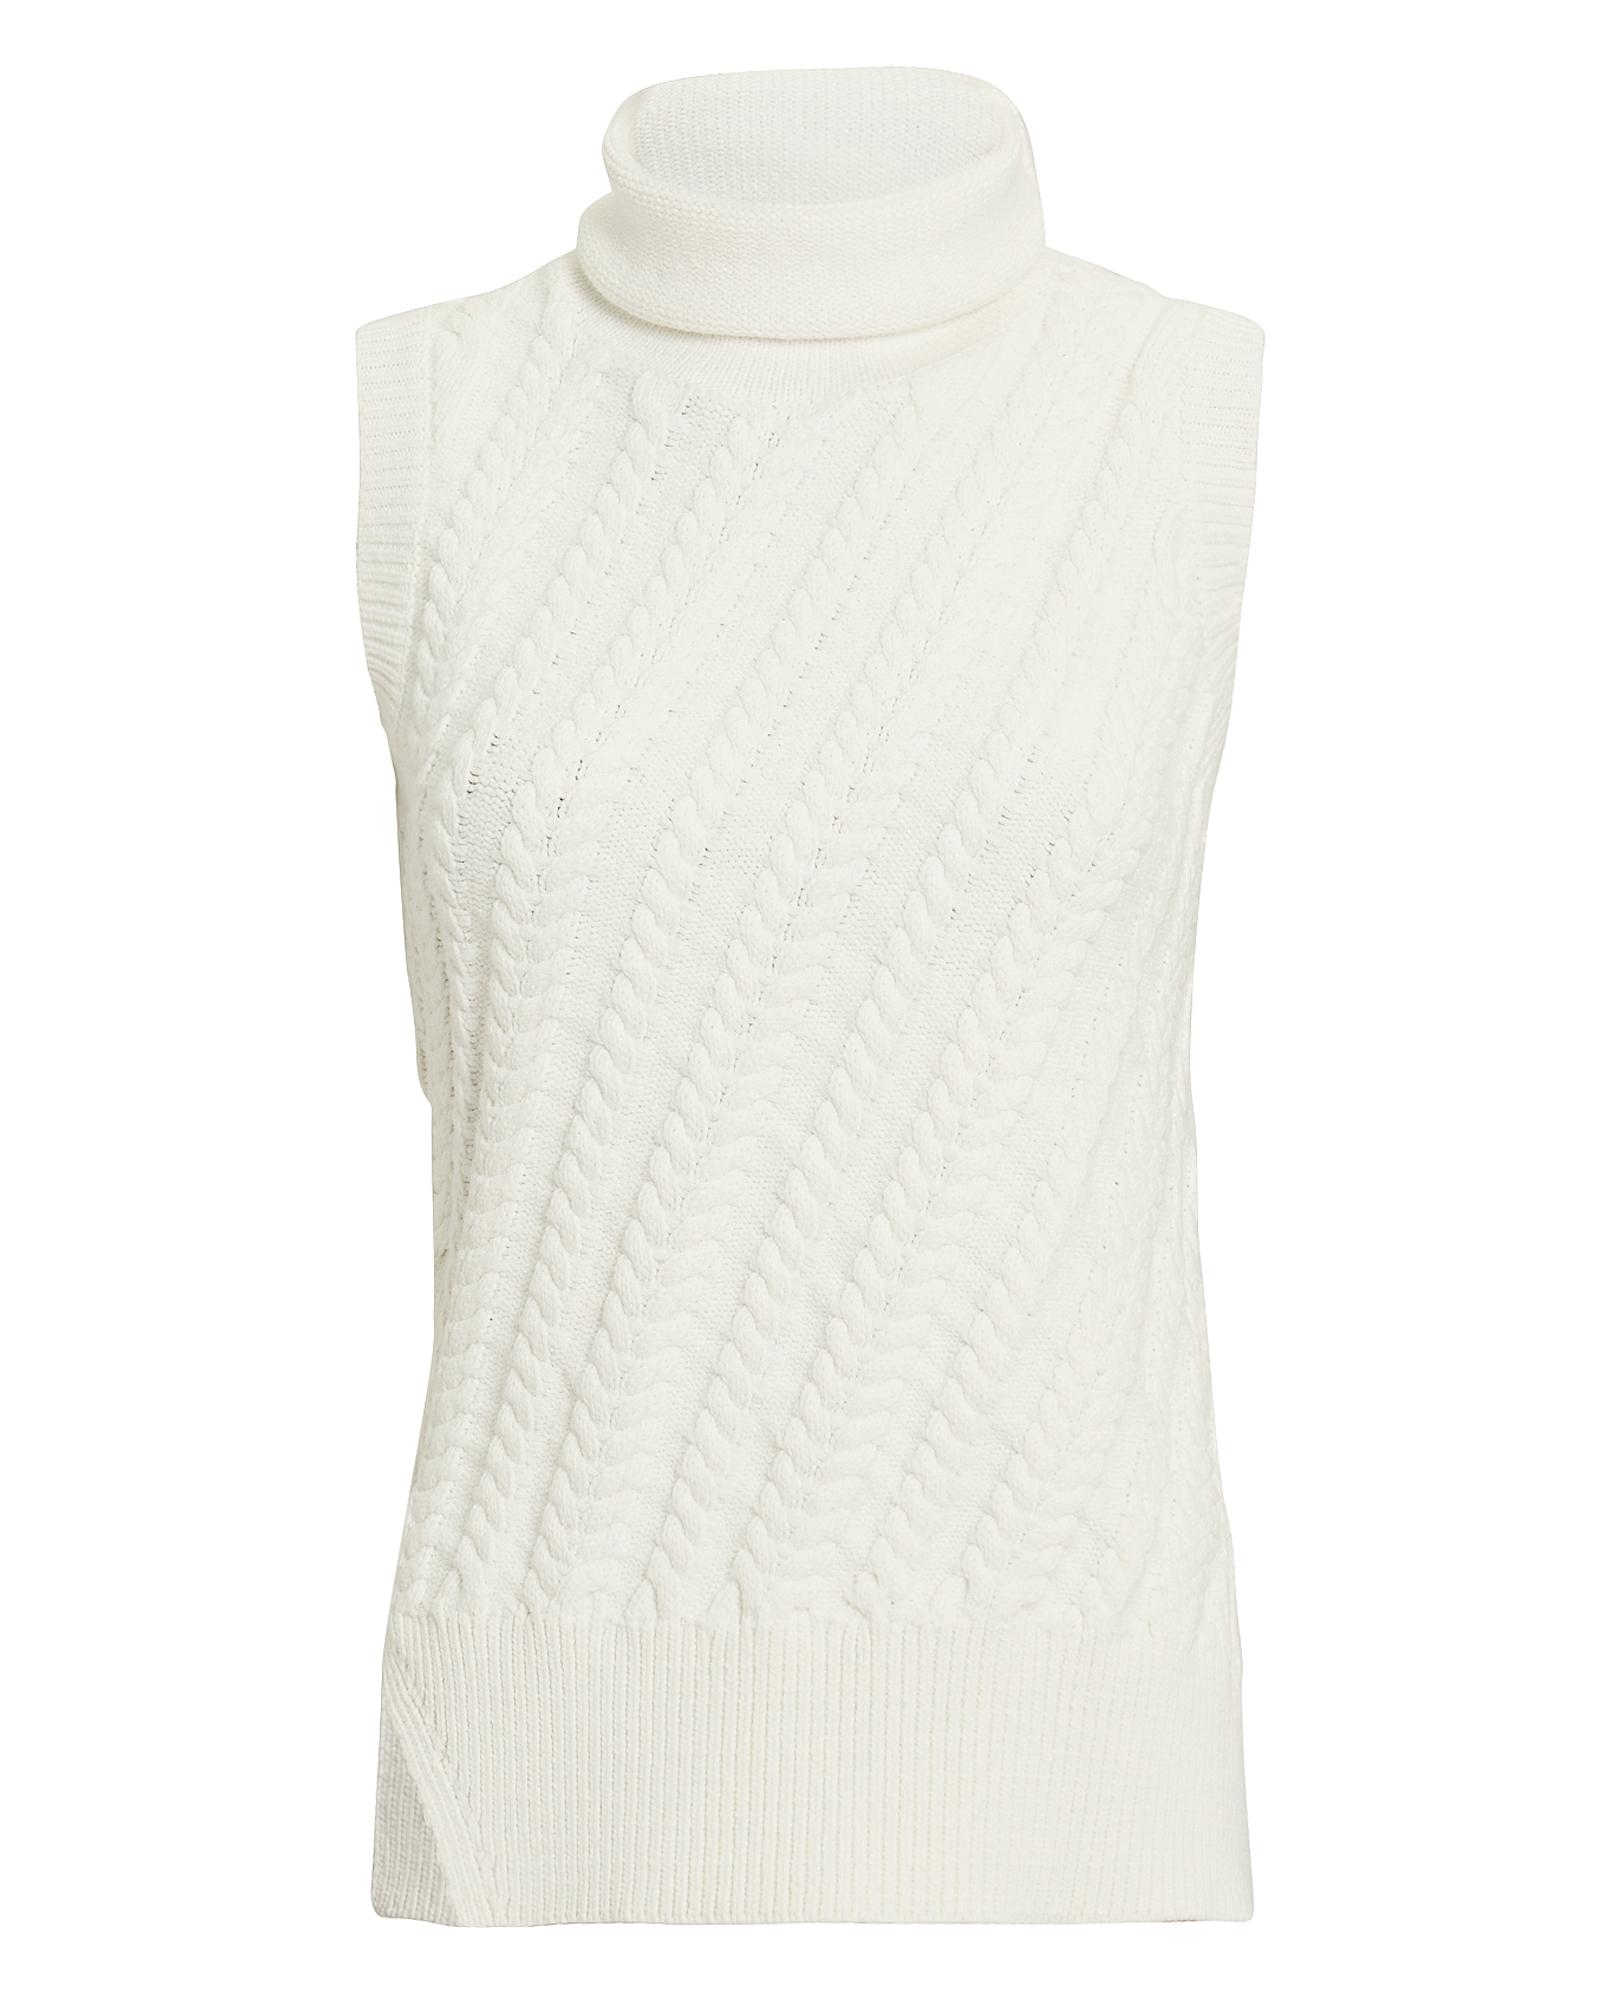 10 CROSBY Turtleneck Knit Sweater